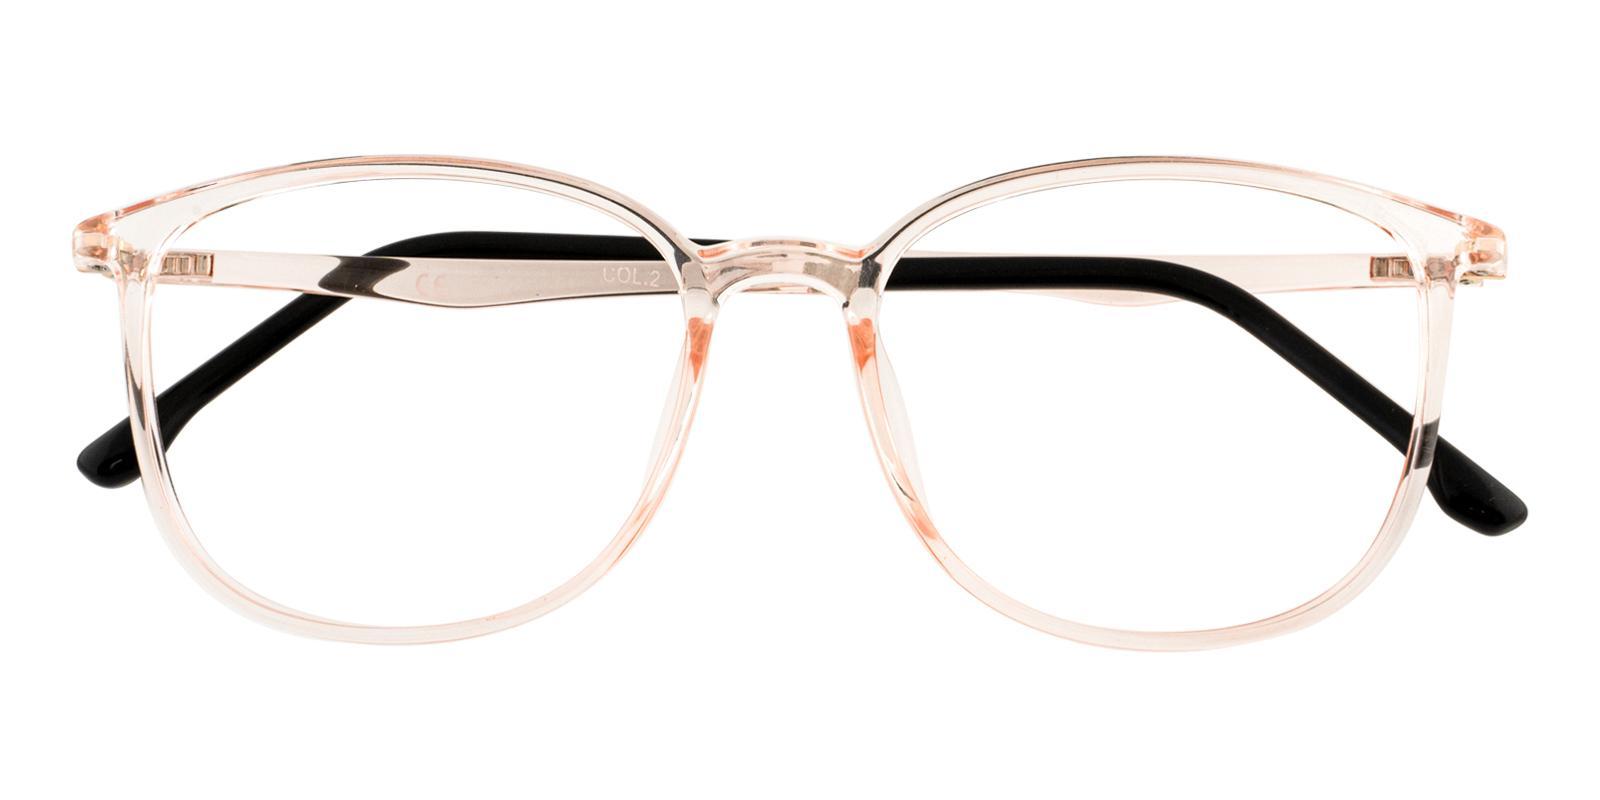 Leah Orange TR Lightweight , UniversalBridgeFit , Eyeglasses Frames from ABBE Glasses